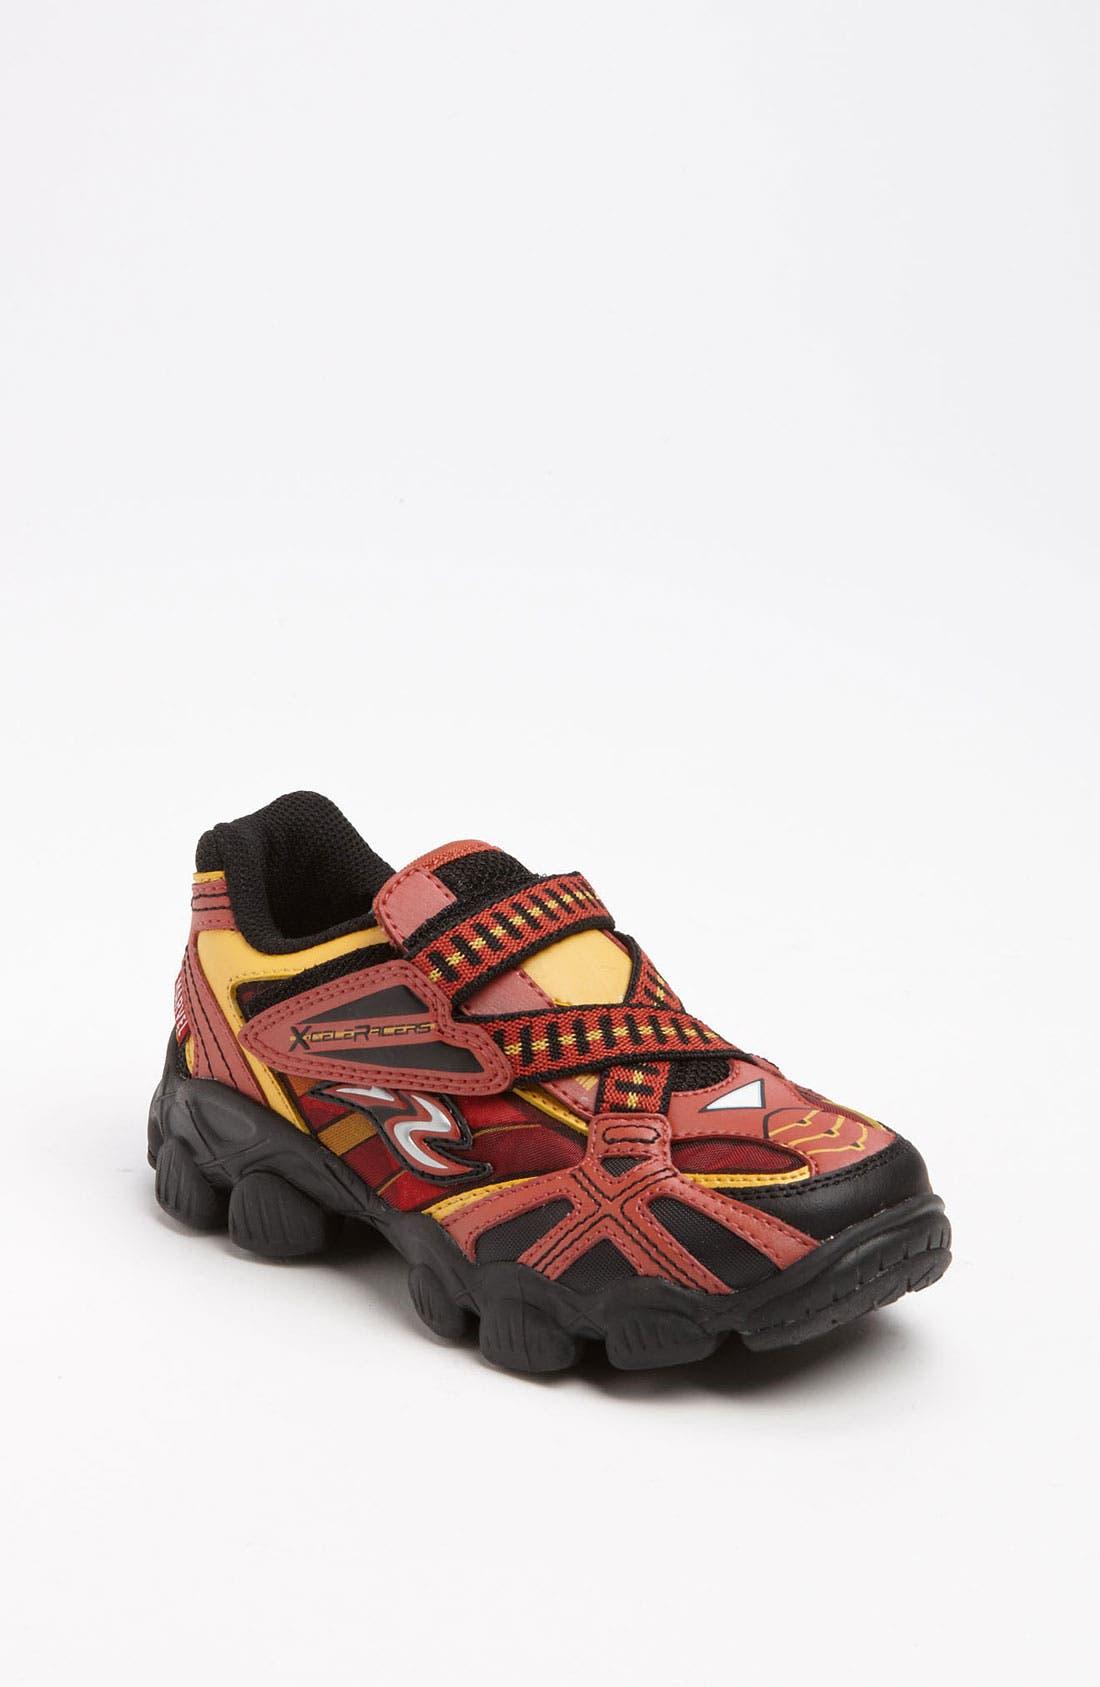 Alternate Image 1 Selected - Stride Ride 'X-Celeracers Iron Man®' Sneaker (Toddler & Little Kid)